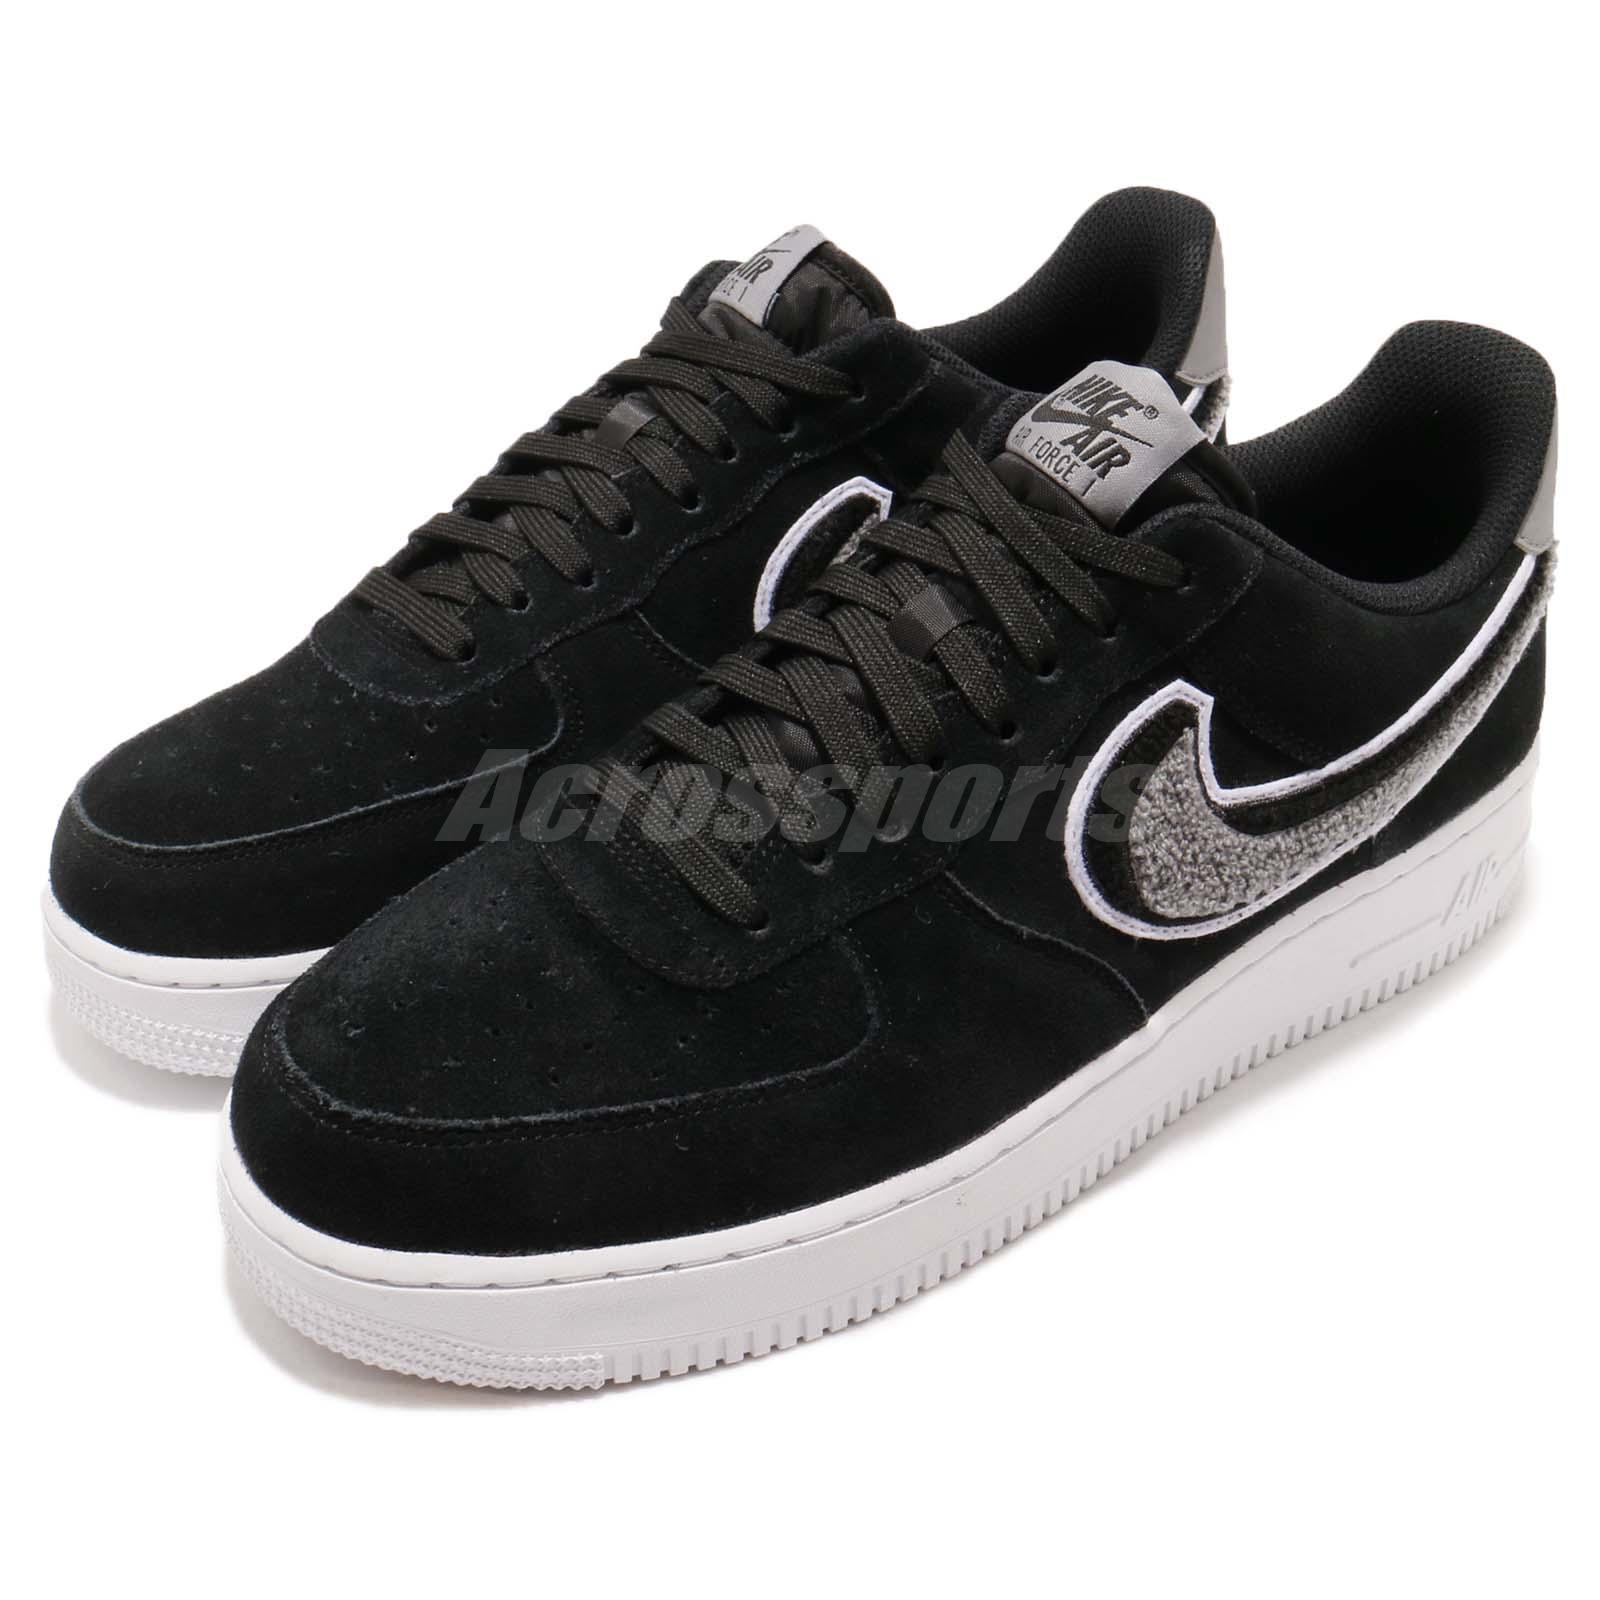 Nike Air Force 1 Low 07 LV8 823511 014